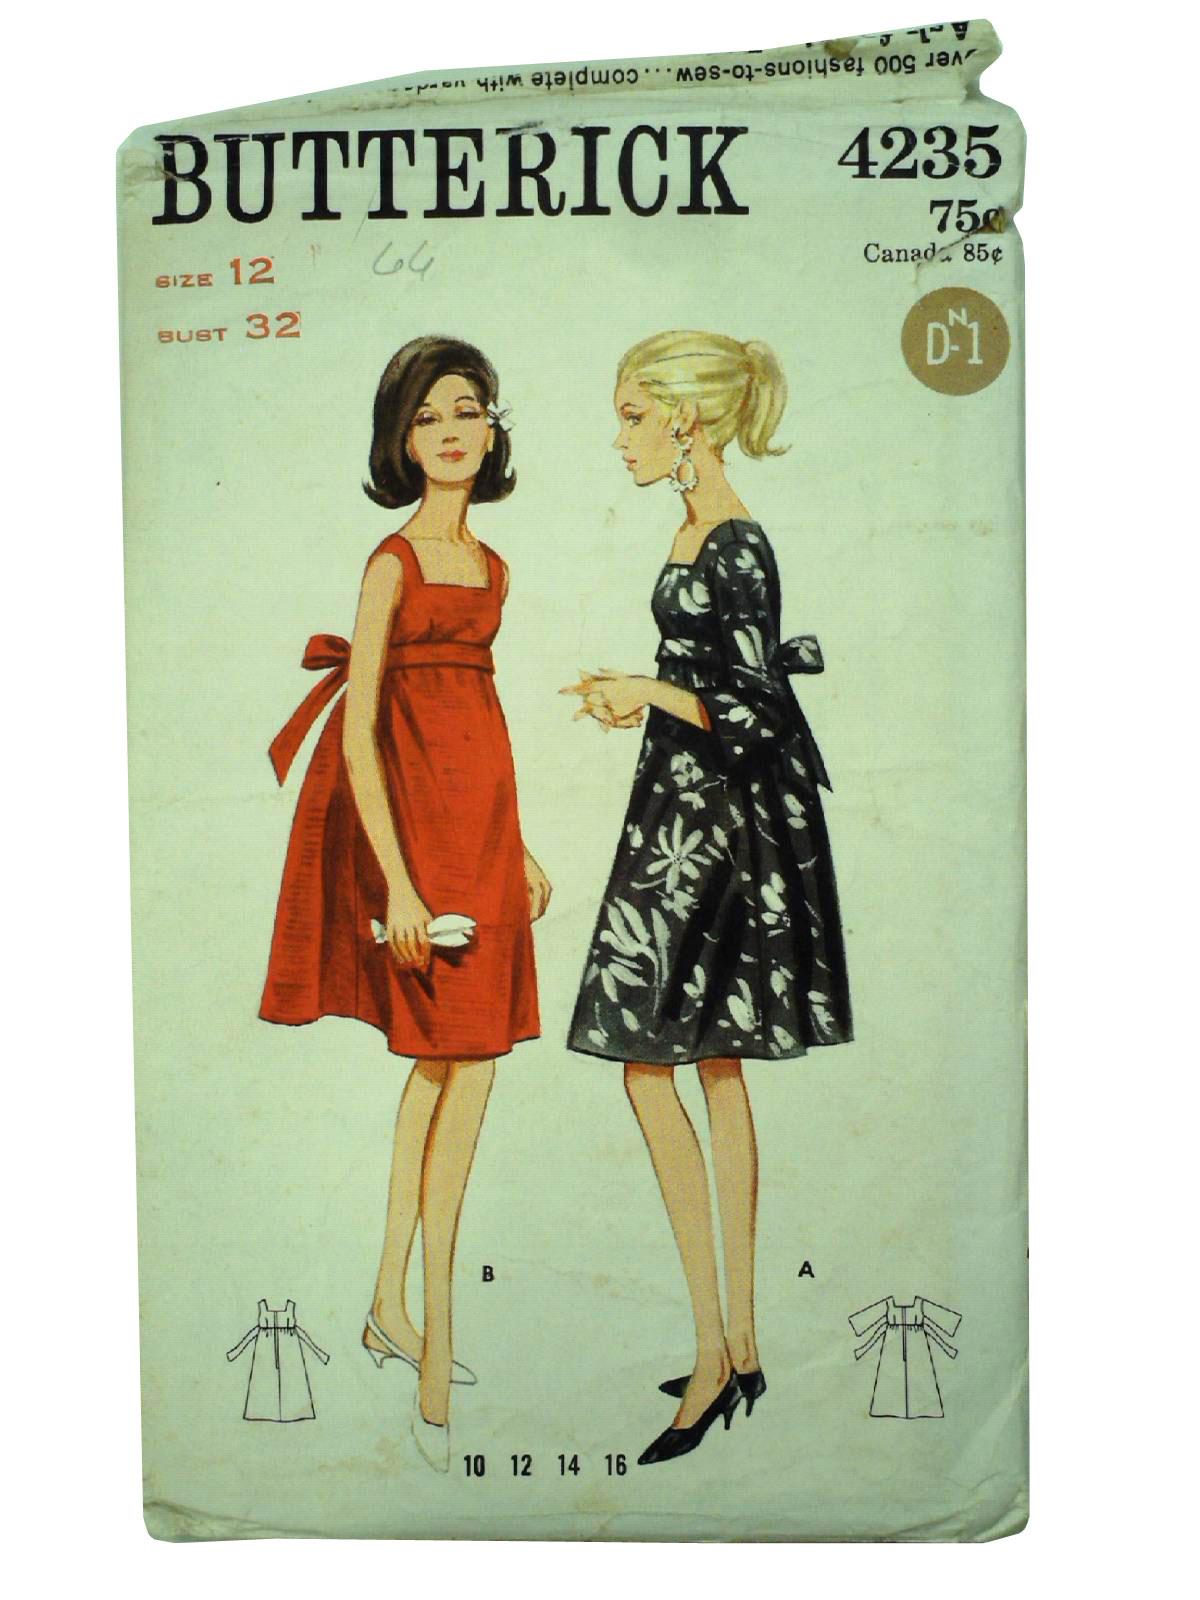 Vintage 1960u0027s Sewing Pattern 60s -Butterick 4235- Womens one-piece mod empire style tent dress pattern with back tie self-belt.  sc 1 st  Rusty Zipper & Vintage 1960u0027s Sewing Pattern: 60s -Butterick 4235- Womens one ...